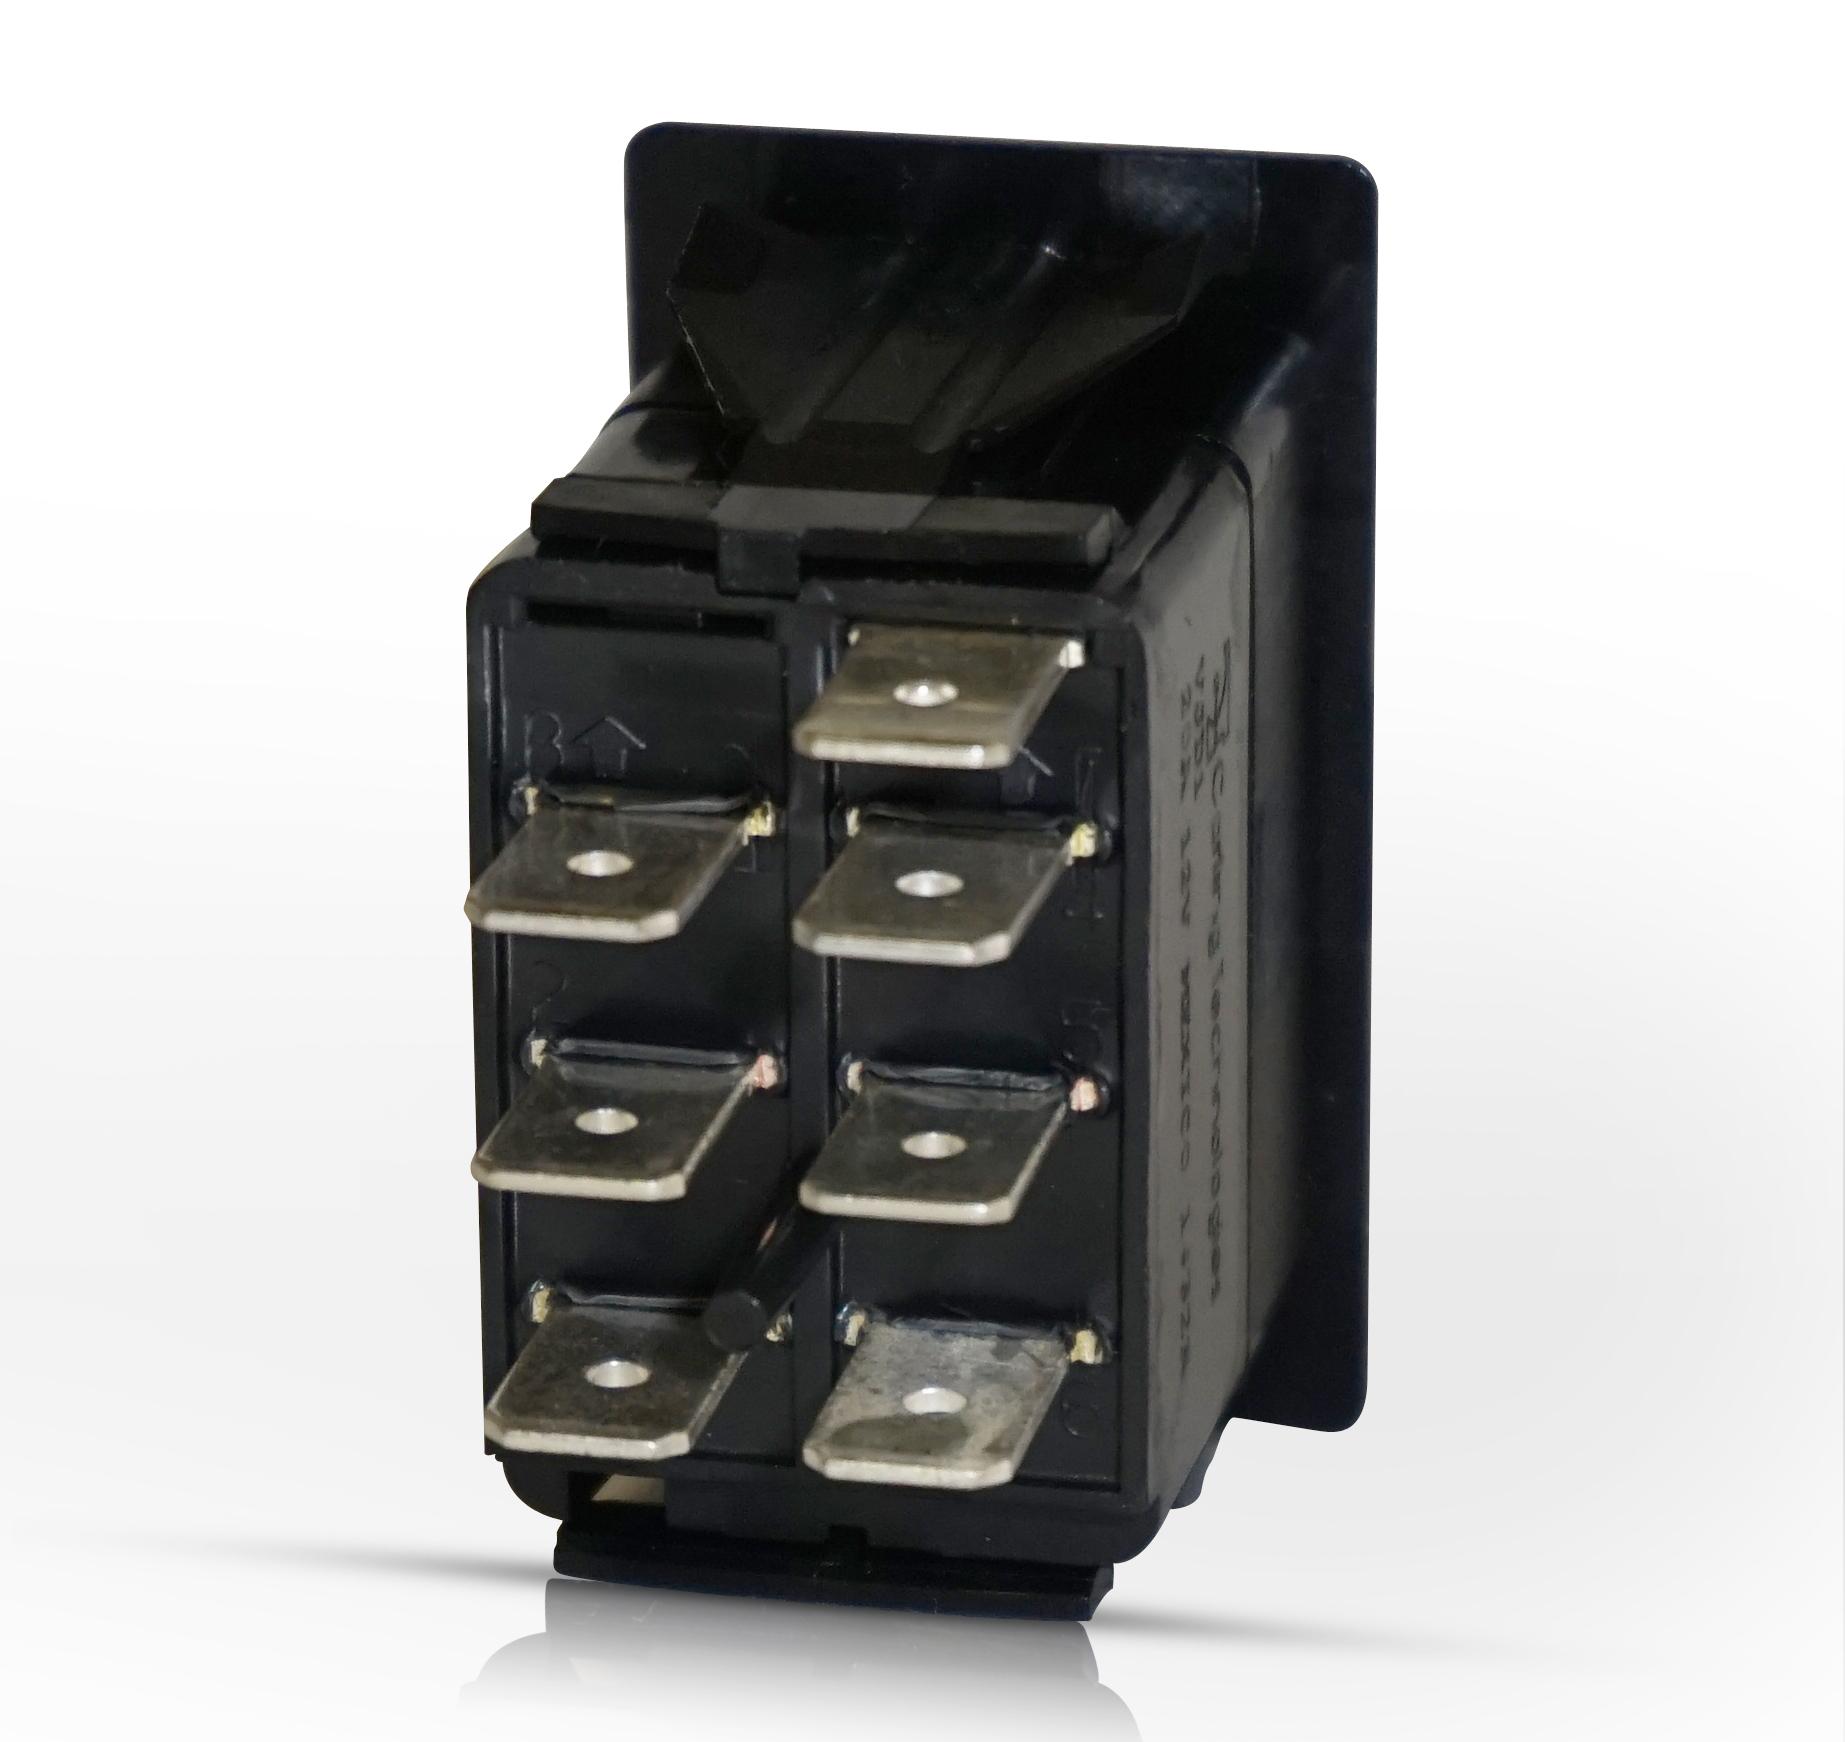 Rocker Switch | On-Off-On | Dpdt | 2 Dep Lights - Carling Rocker Switch Wiring Diagram